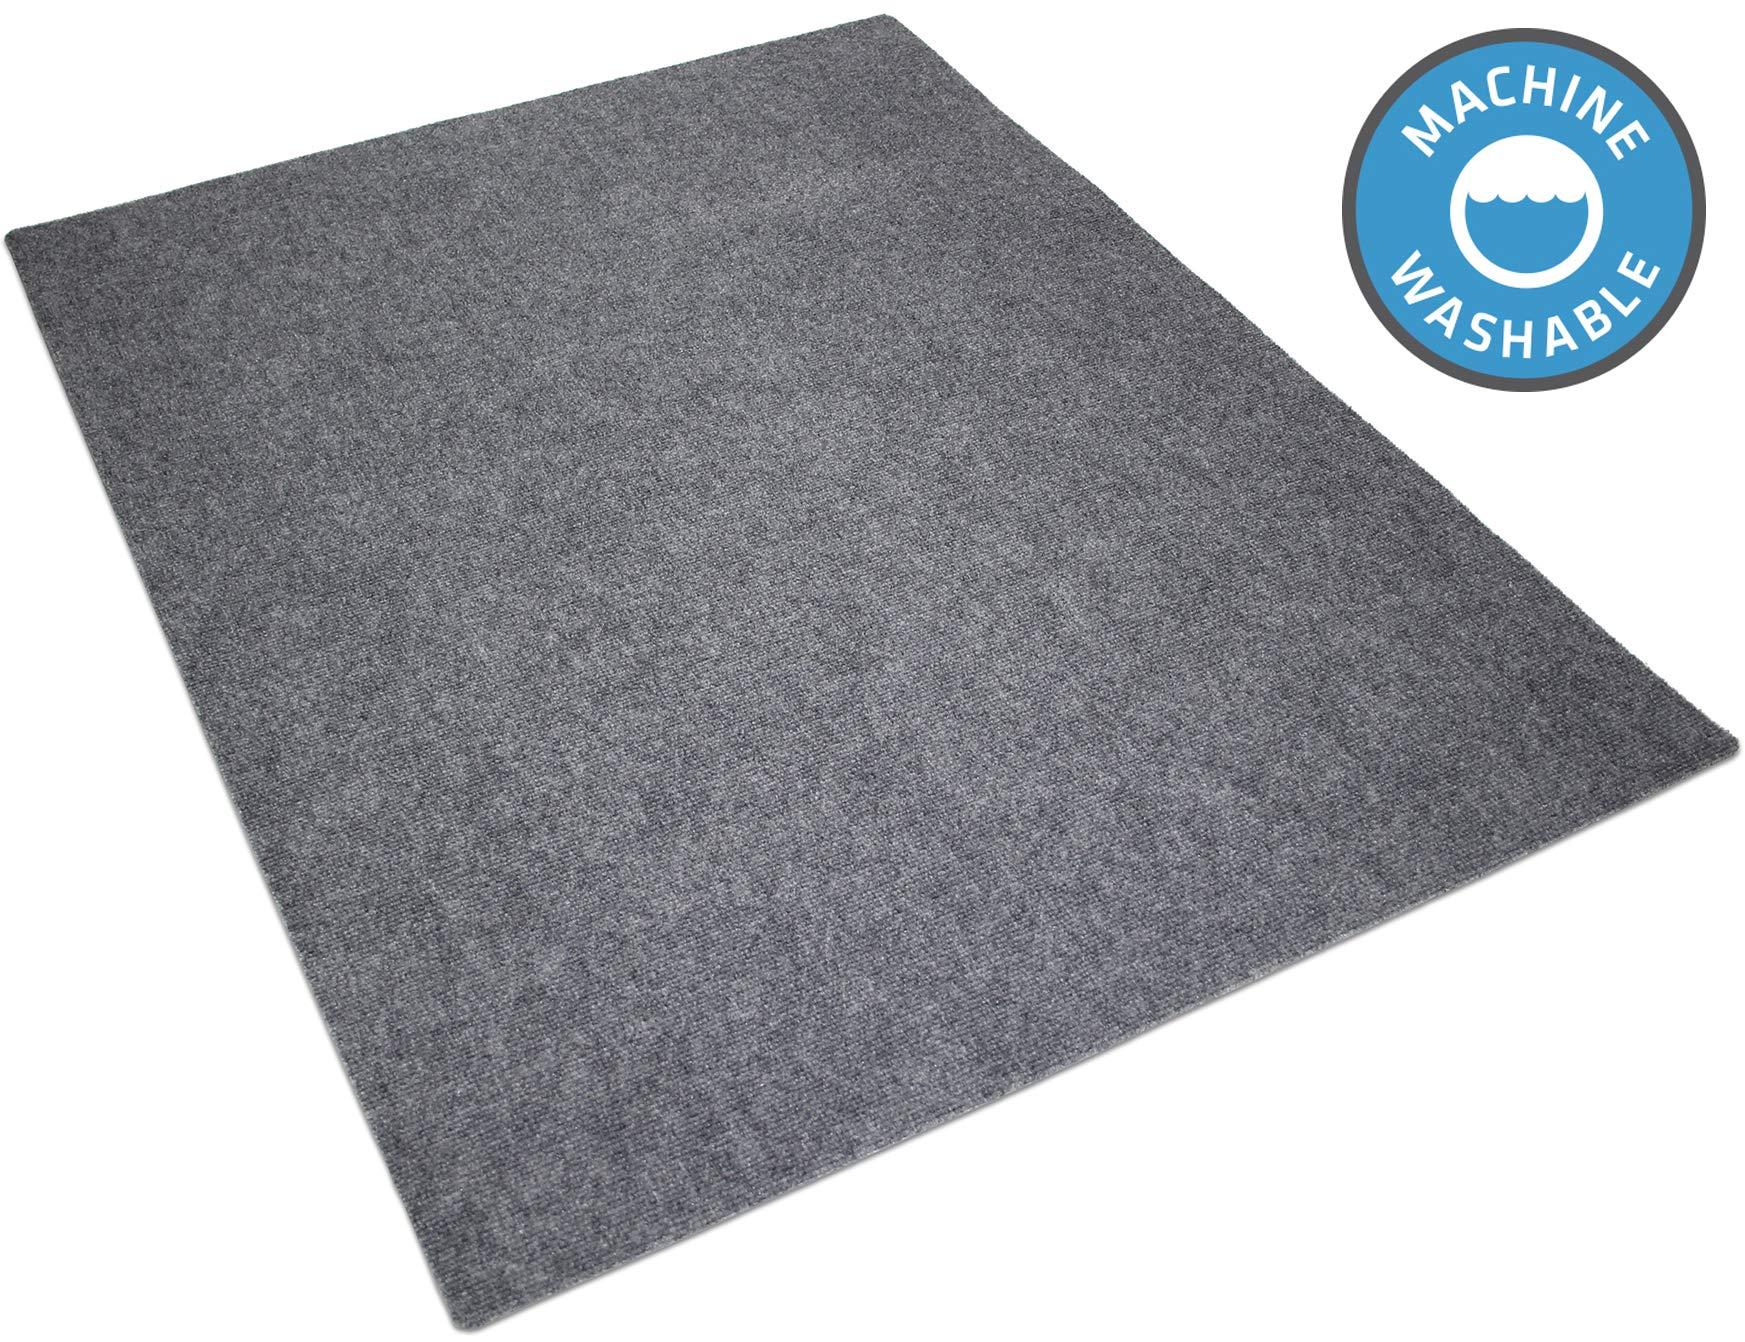 Drymate Jumbo Premium Cat Litter Mat (47'' x 36'', Charcoal) Litter Trapping Mat by Drymate